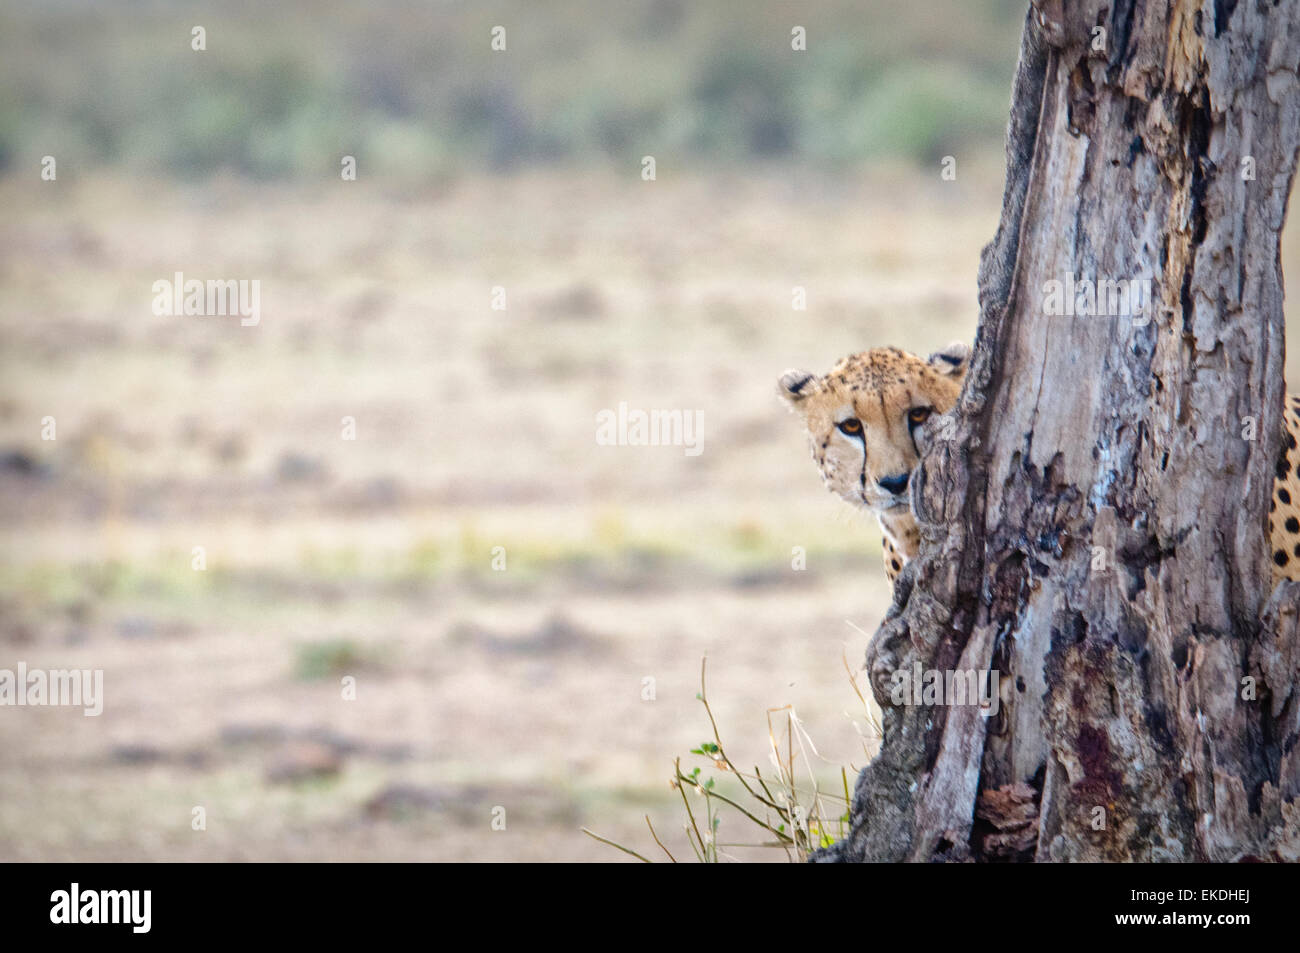 Giovani, ghepardo Acinonyx jubatus, nascondendo e spiata da dietro a un albero nel Masai Mara, Kenya, Africa orientale Immagini Stock